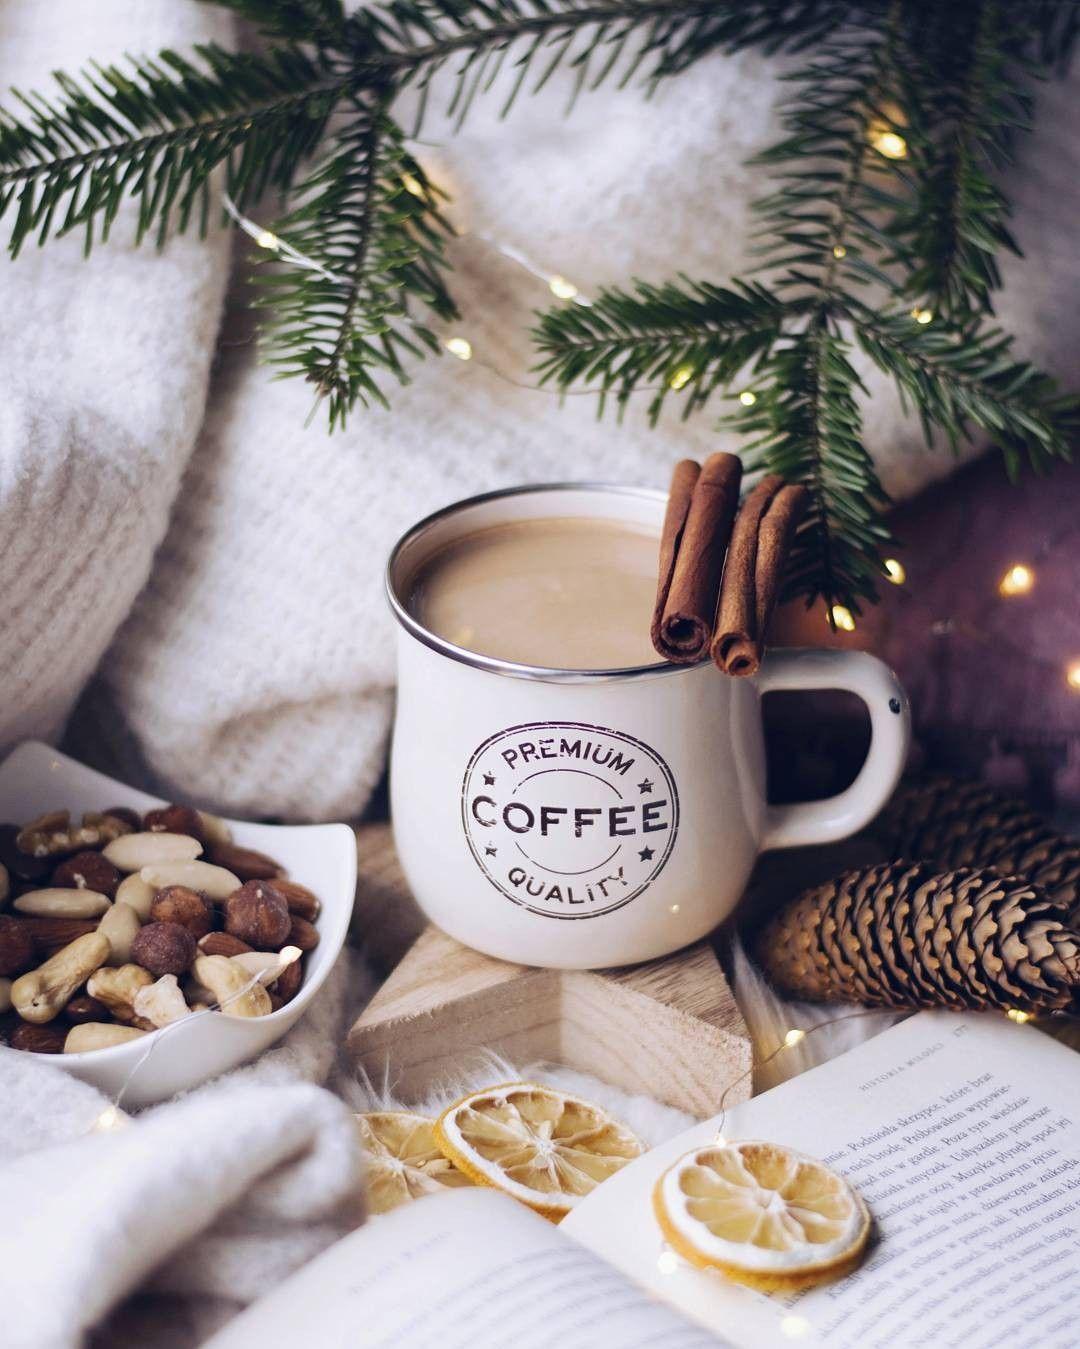 Coffee photo inspiration